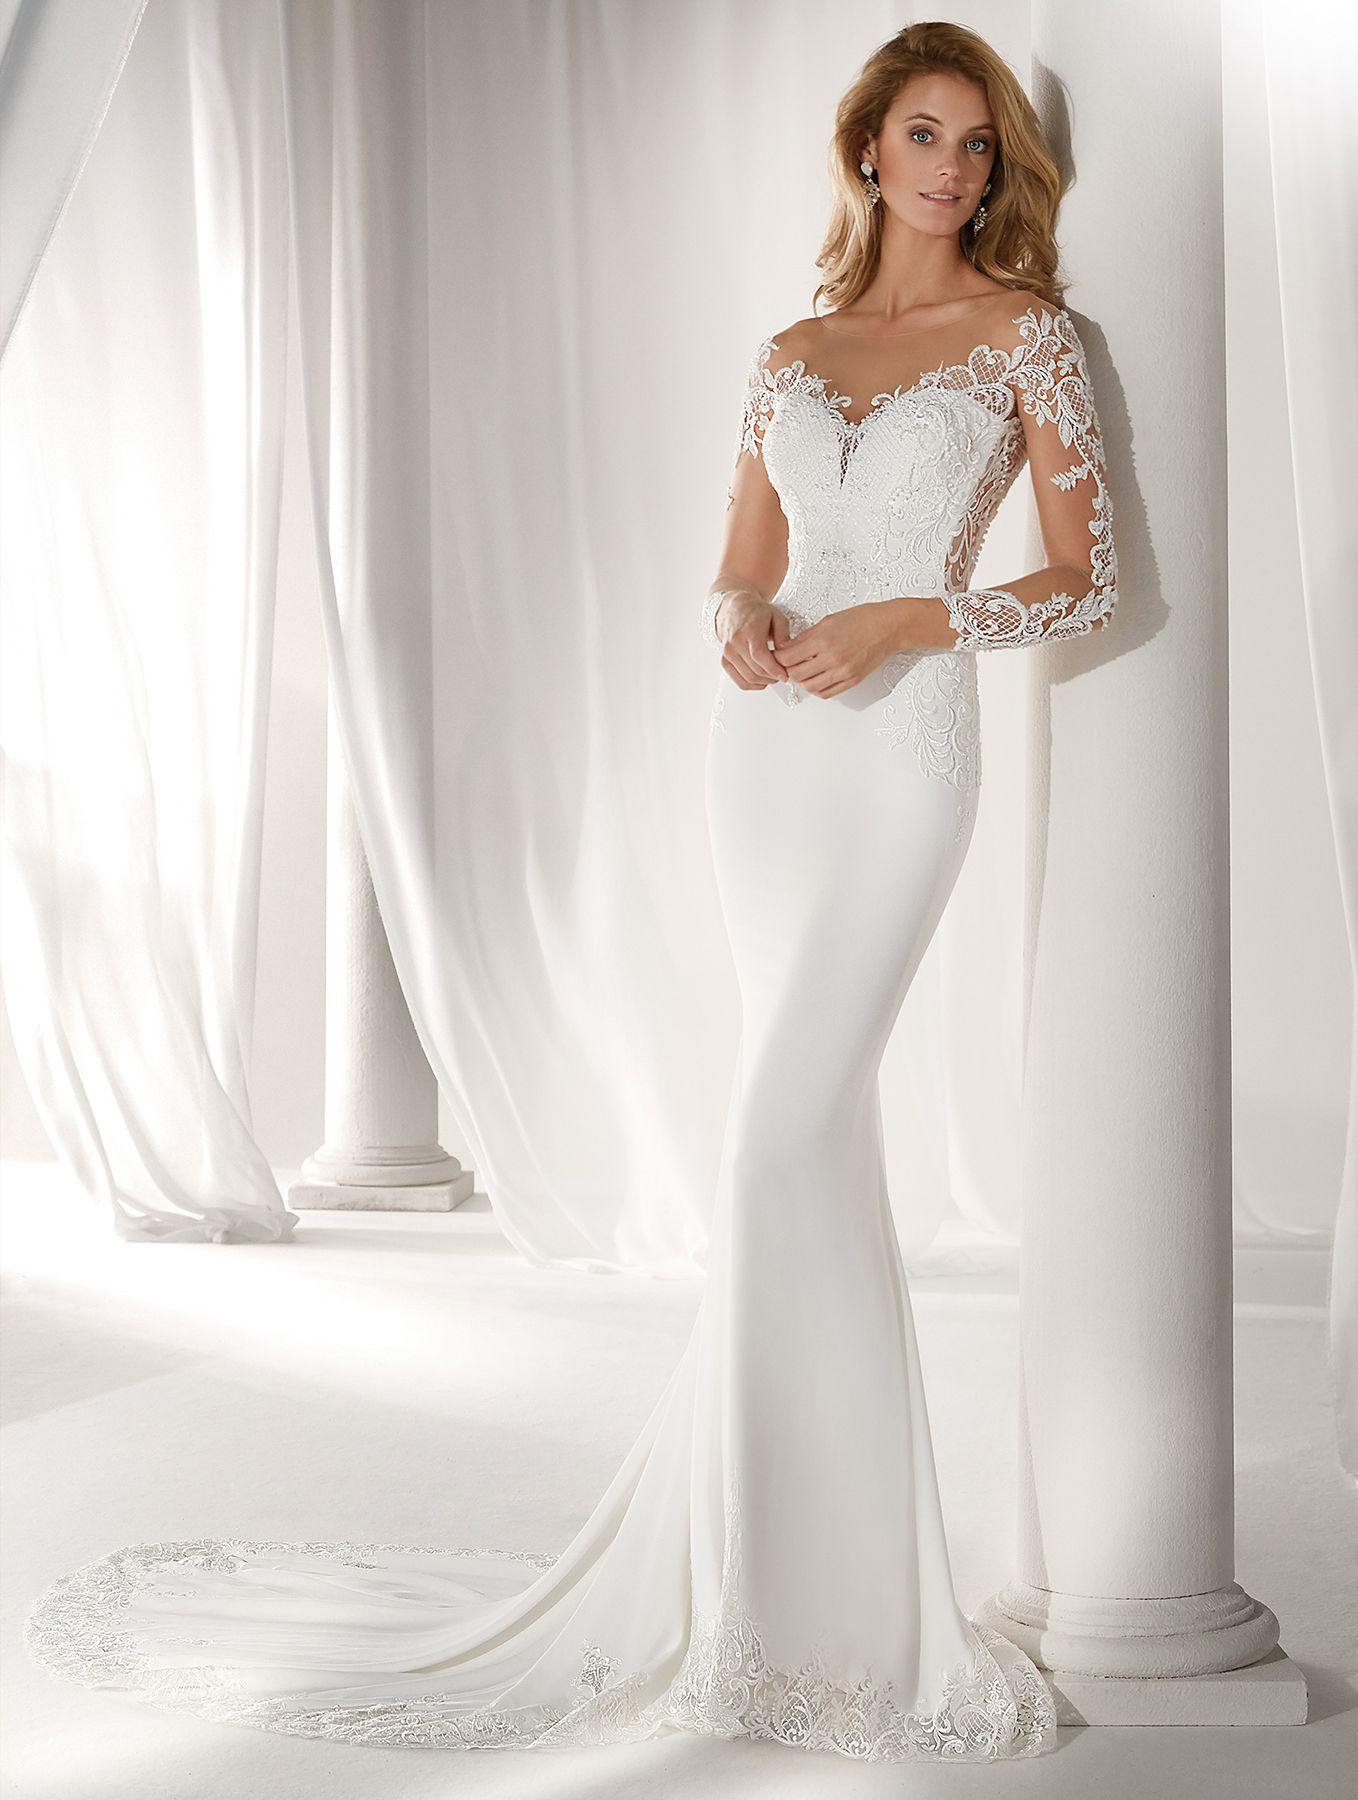 Vestido de Novia de Nicole (NIAB19043) #bodas #wedding #weddingdress #bride #novia #vestidodenovia #bridelook #bridedress #tendencias2019 #mangas #sleeves